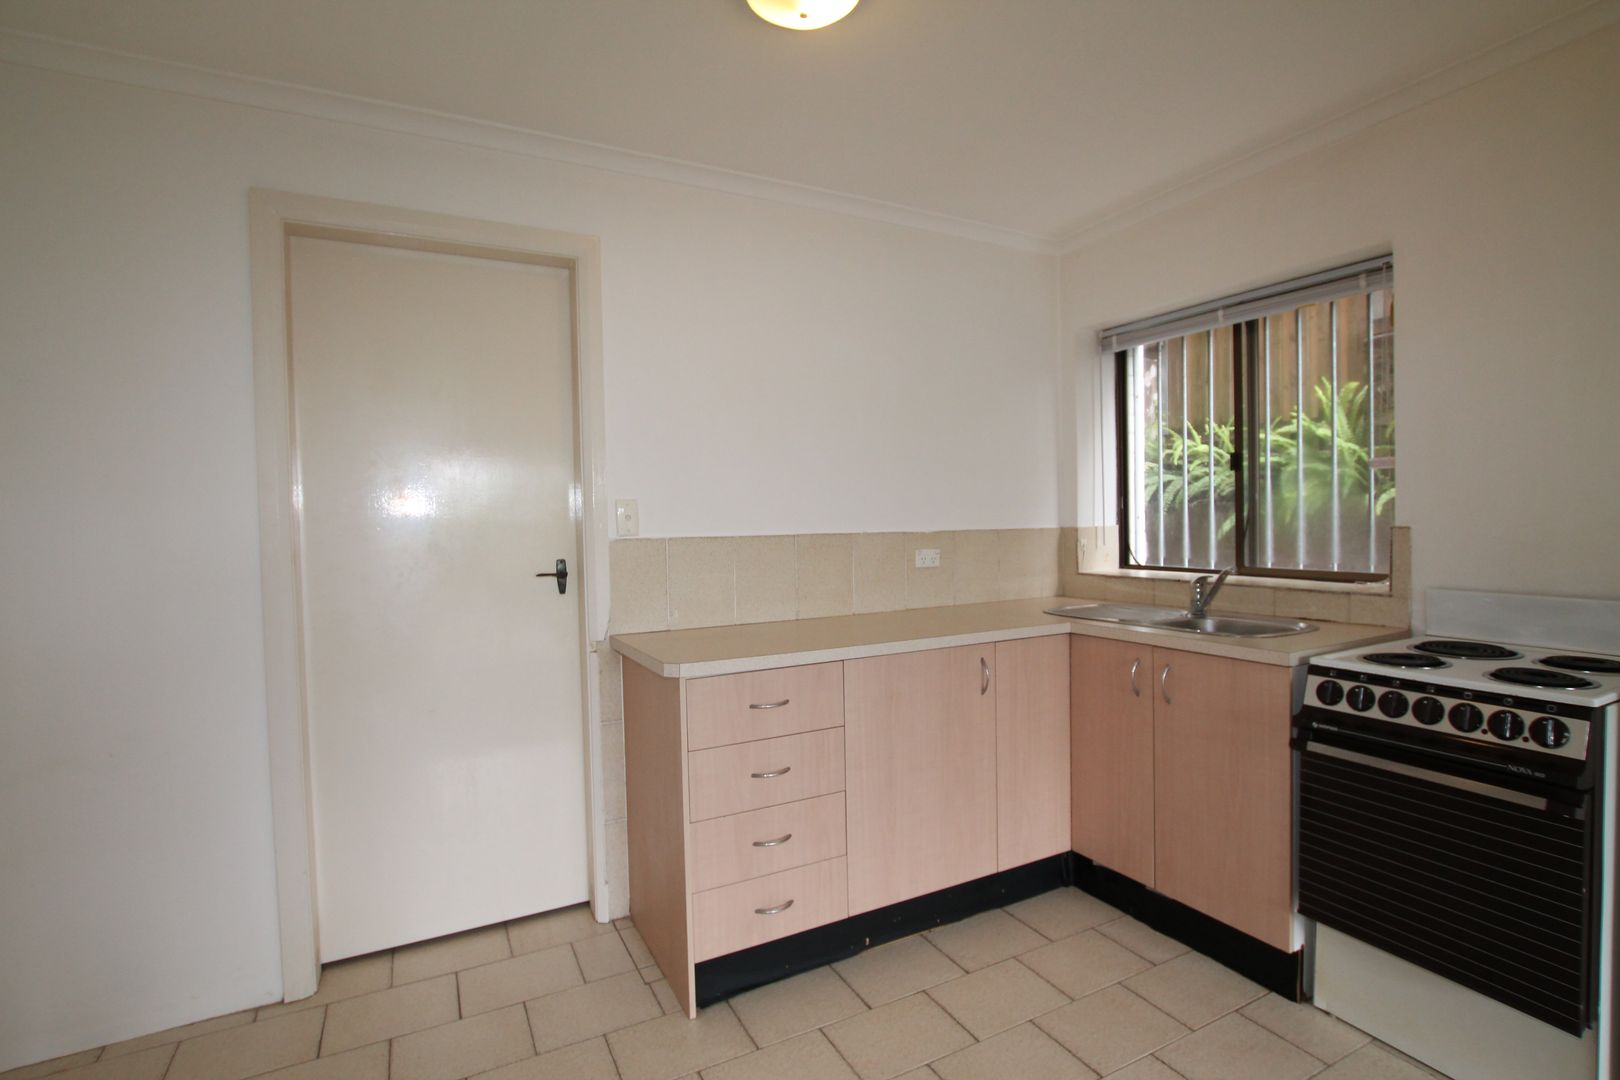 6/211 Edgecliff Road, Woollahra NSW 2025, Image 1